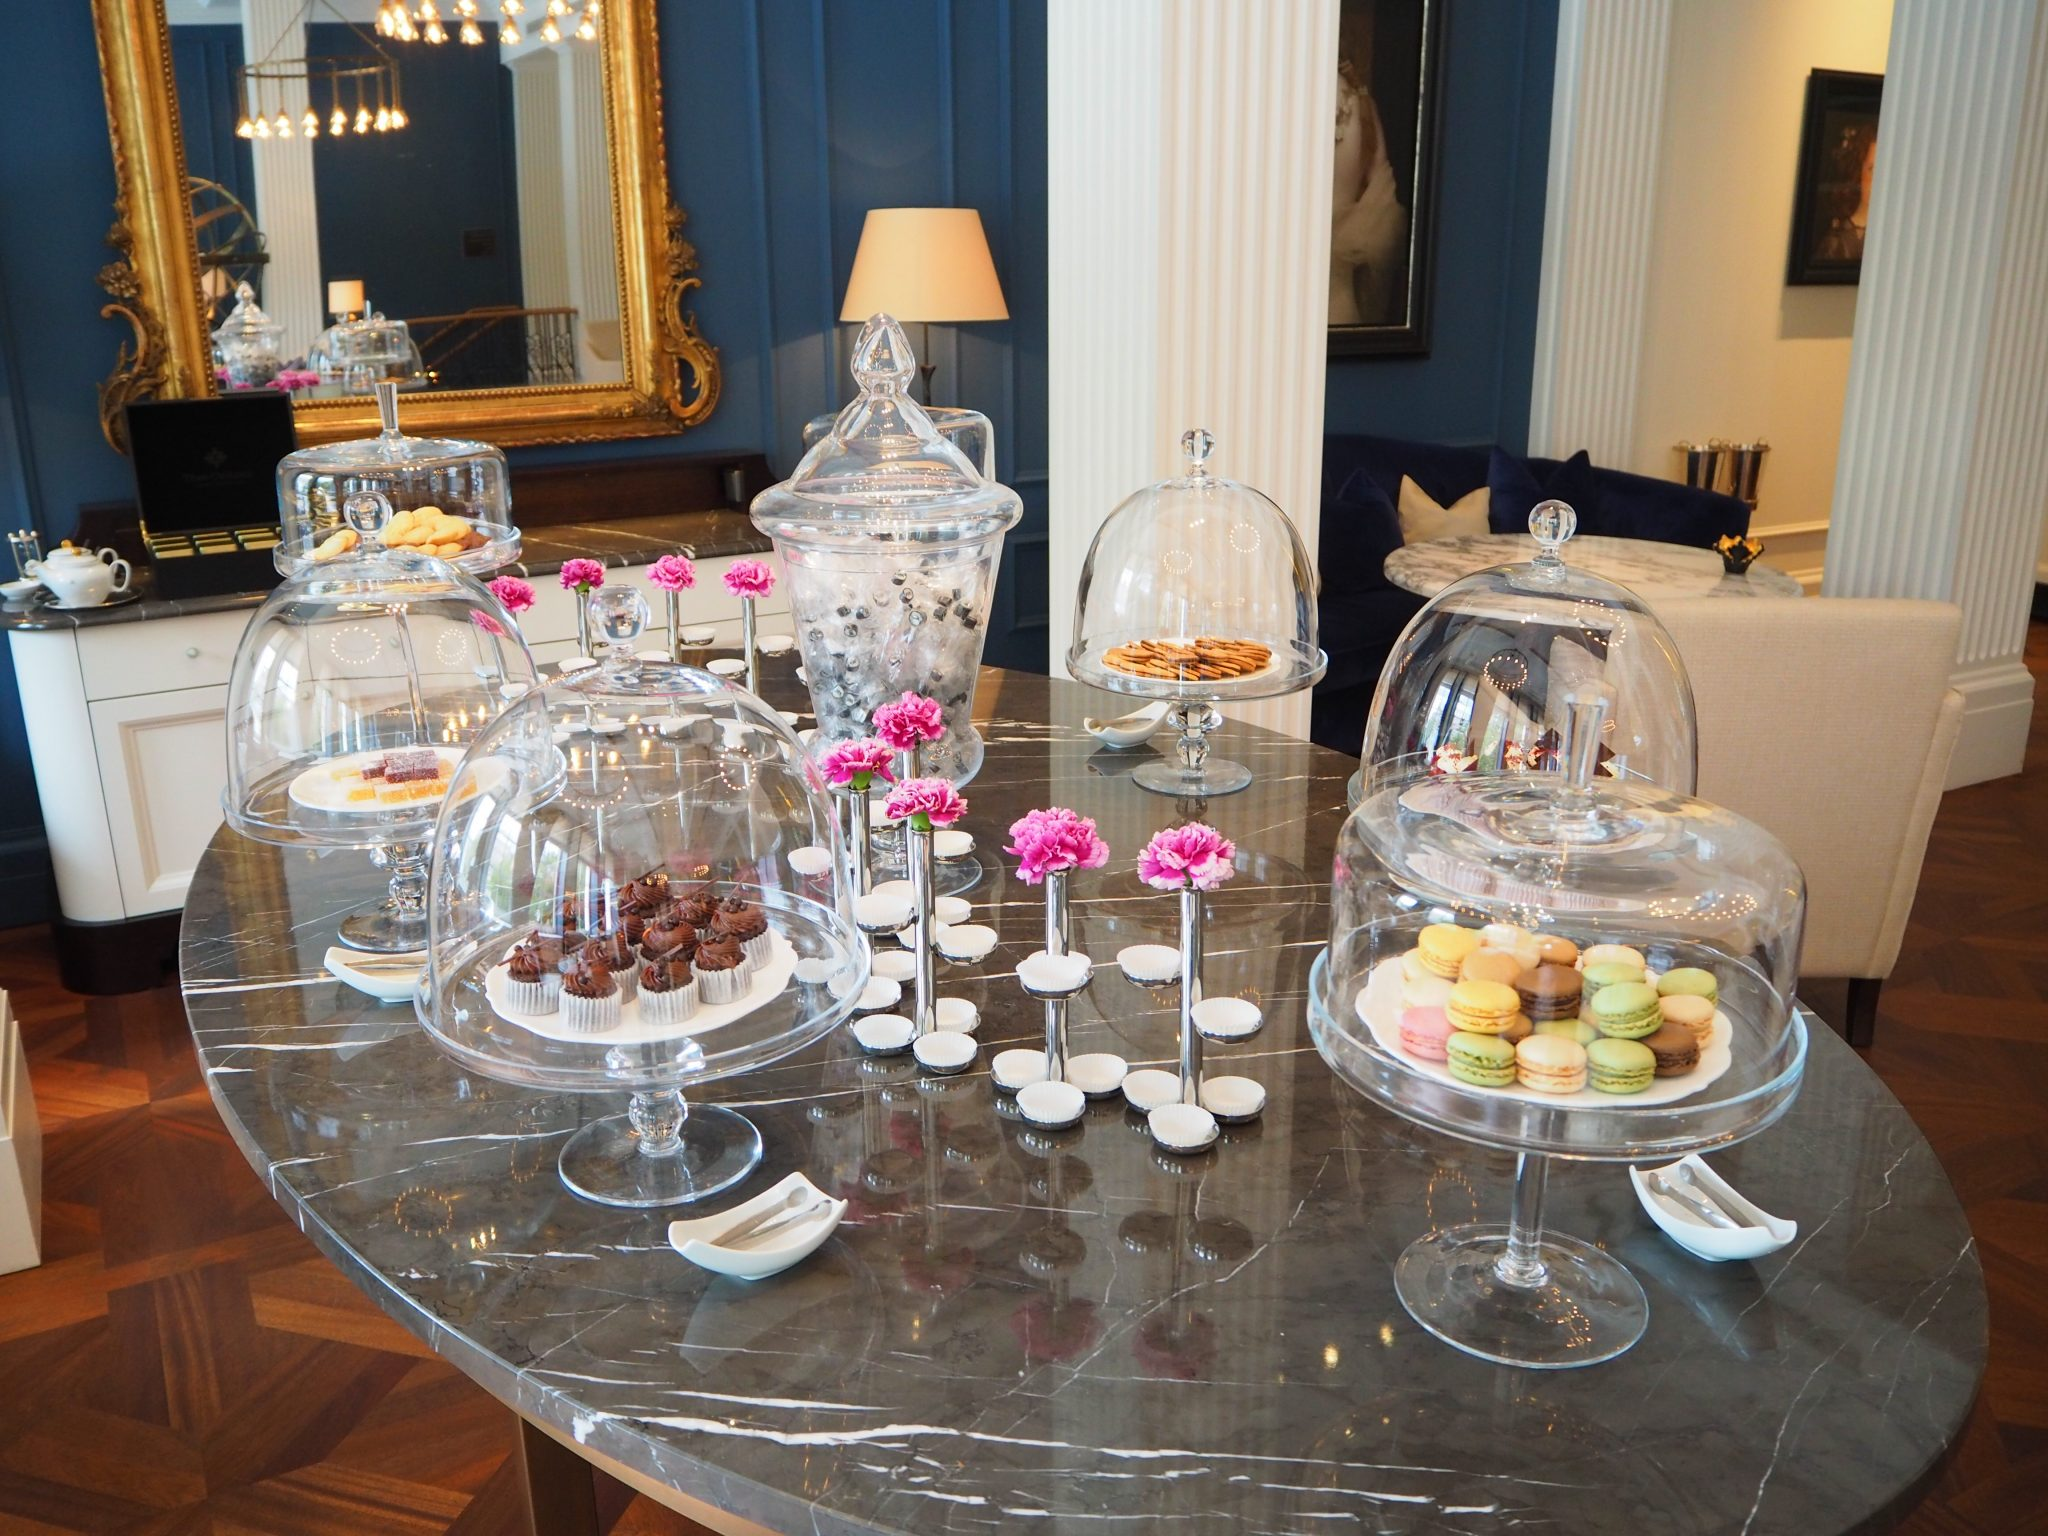 """A la Carte"" Cakes & Pastries - Afternoon Tea - The Waldorf Astoria Amsterdam"